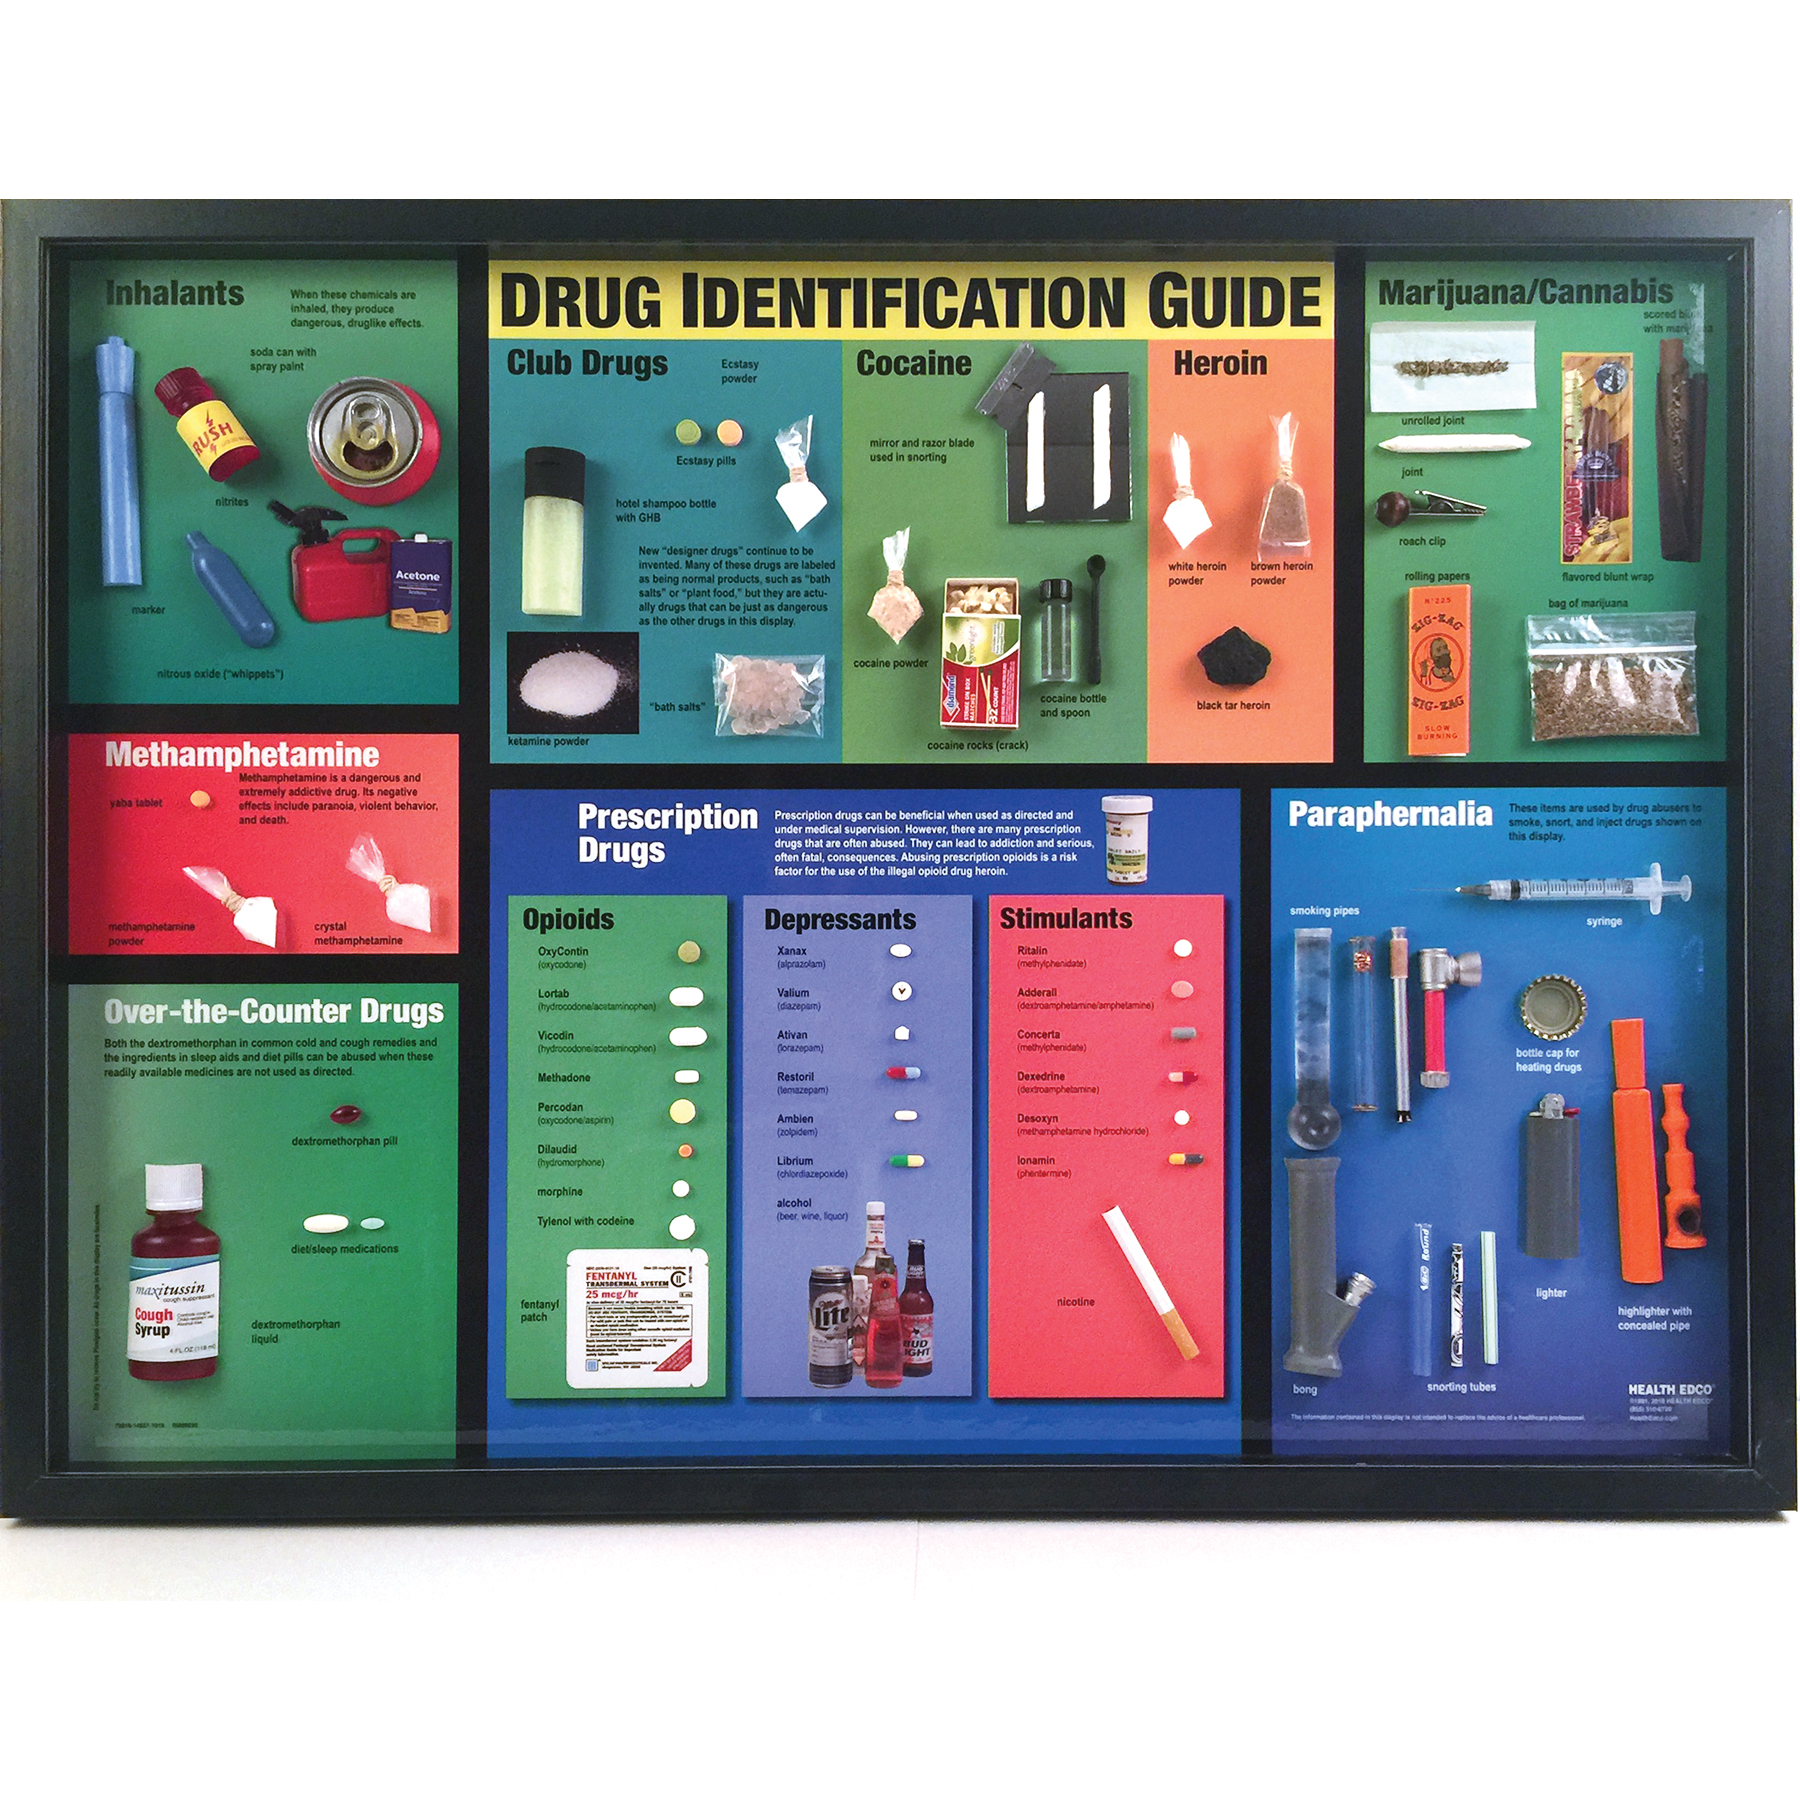 Drug Identification Guide